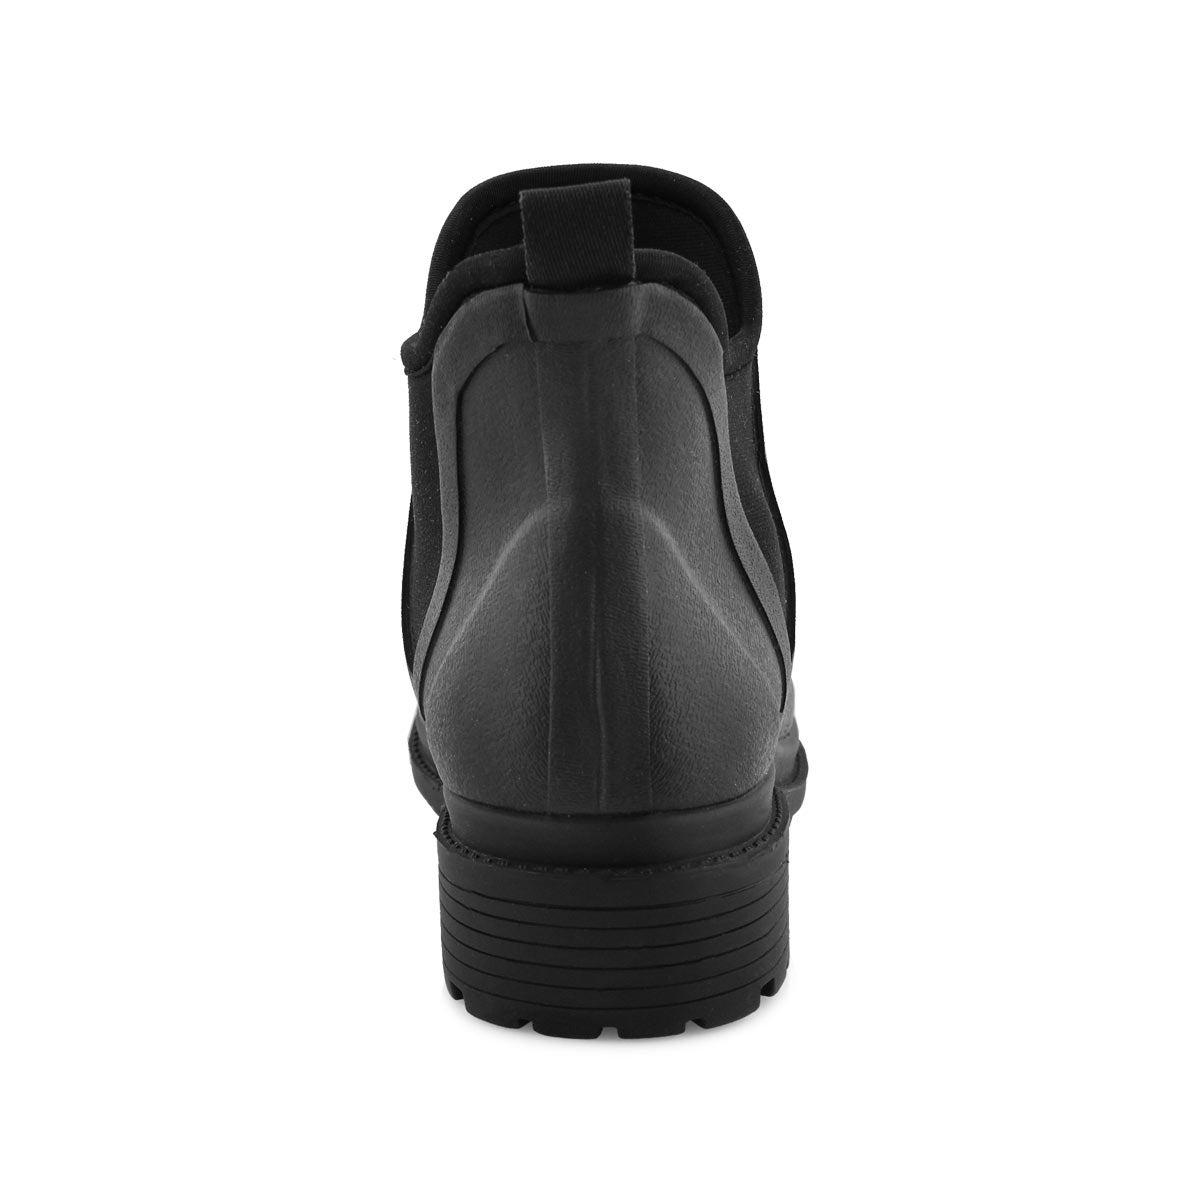 Women's DREW black waterproof chelsea boots